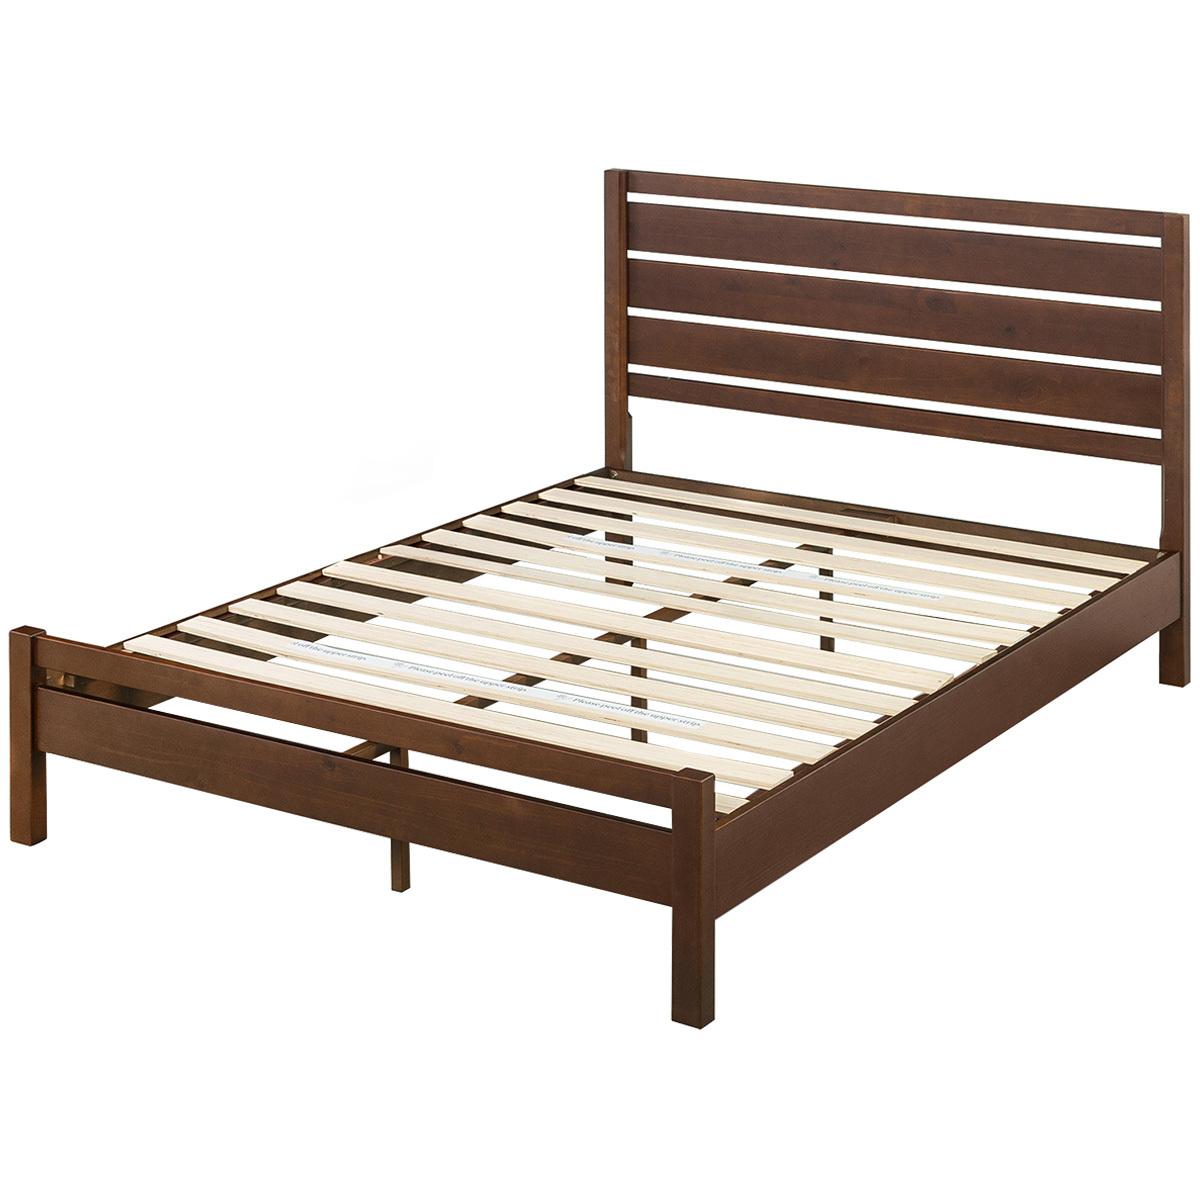 Blackstone Garland Wood Paneled Platform Queen Bed Costco Australia